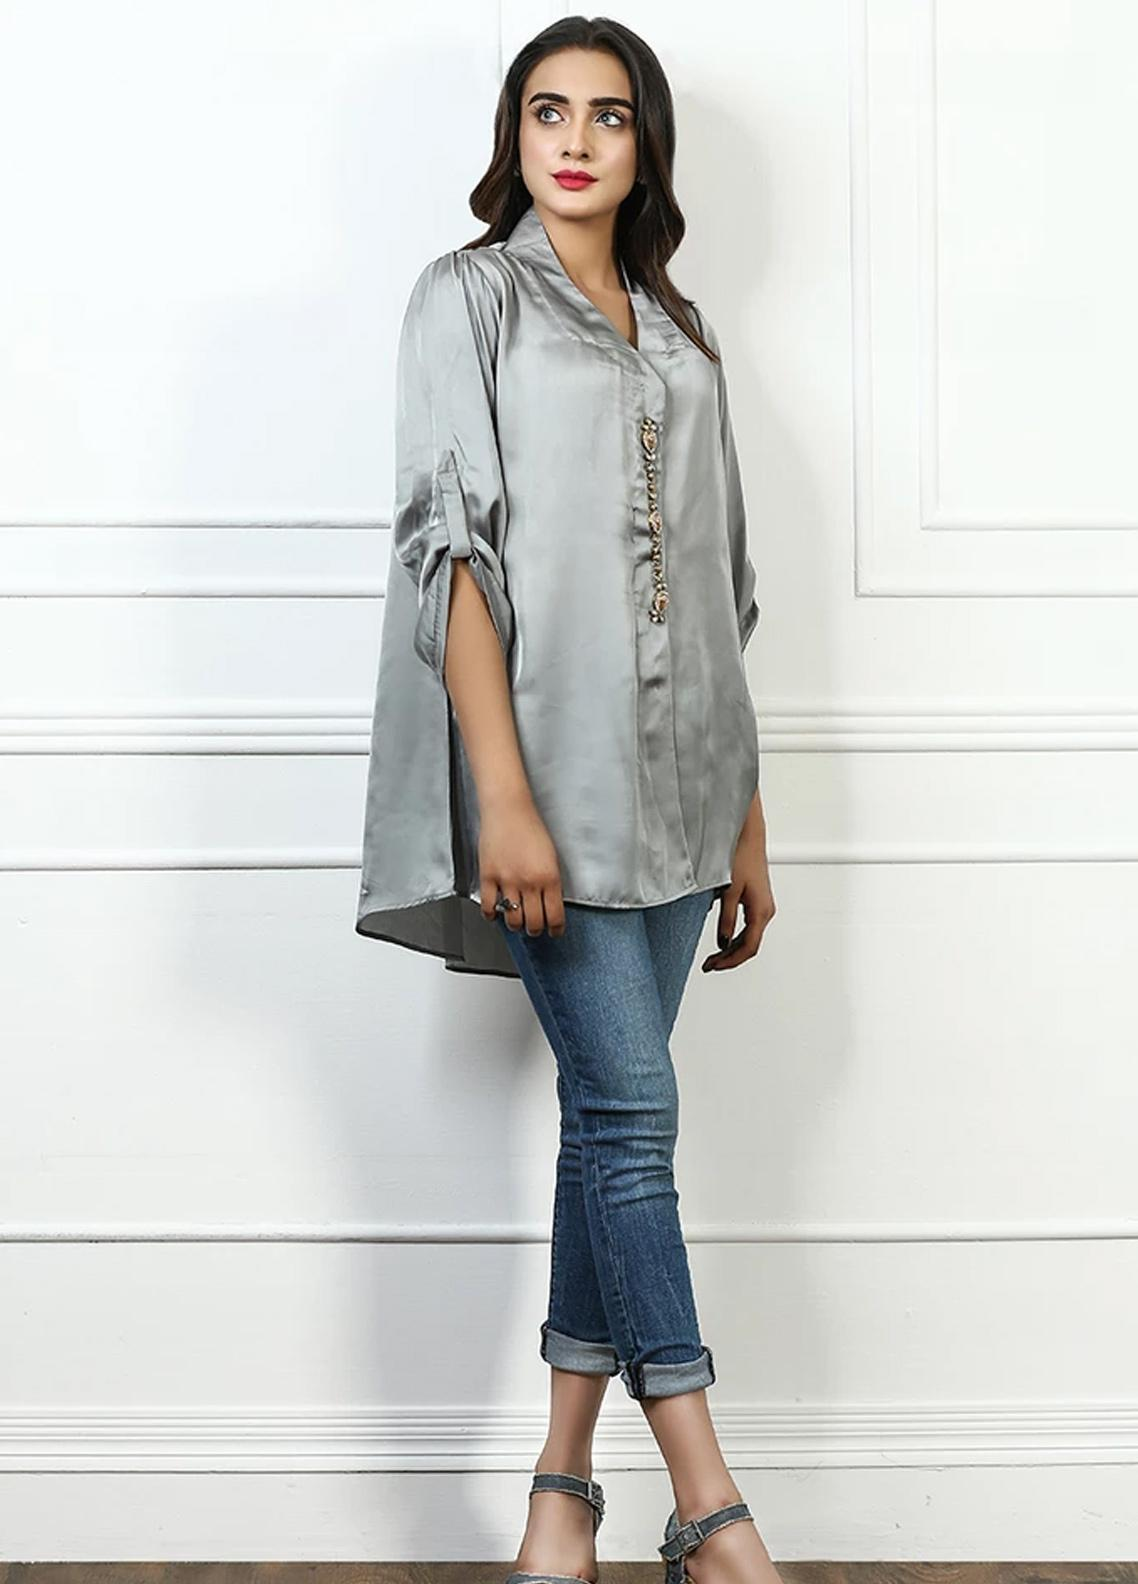 Pulsar Fancy Style Silk Stitched Kurtis Grey Grand